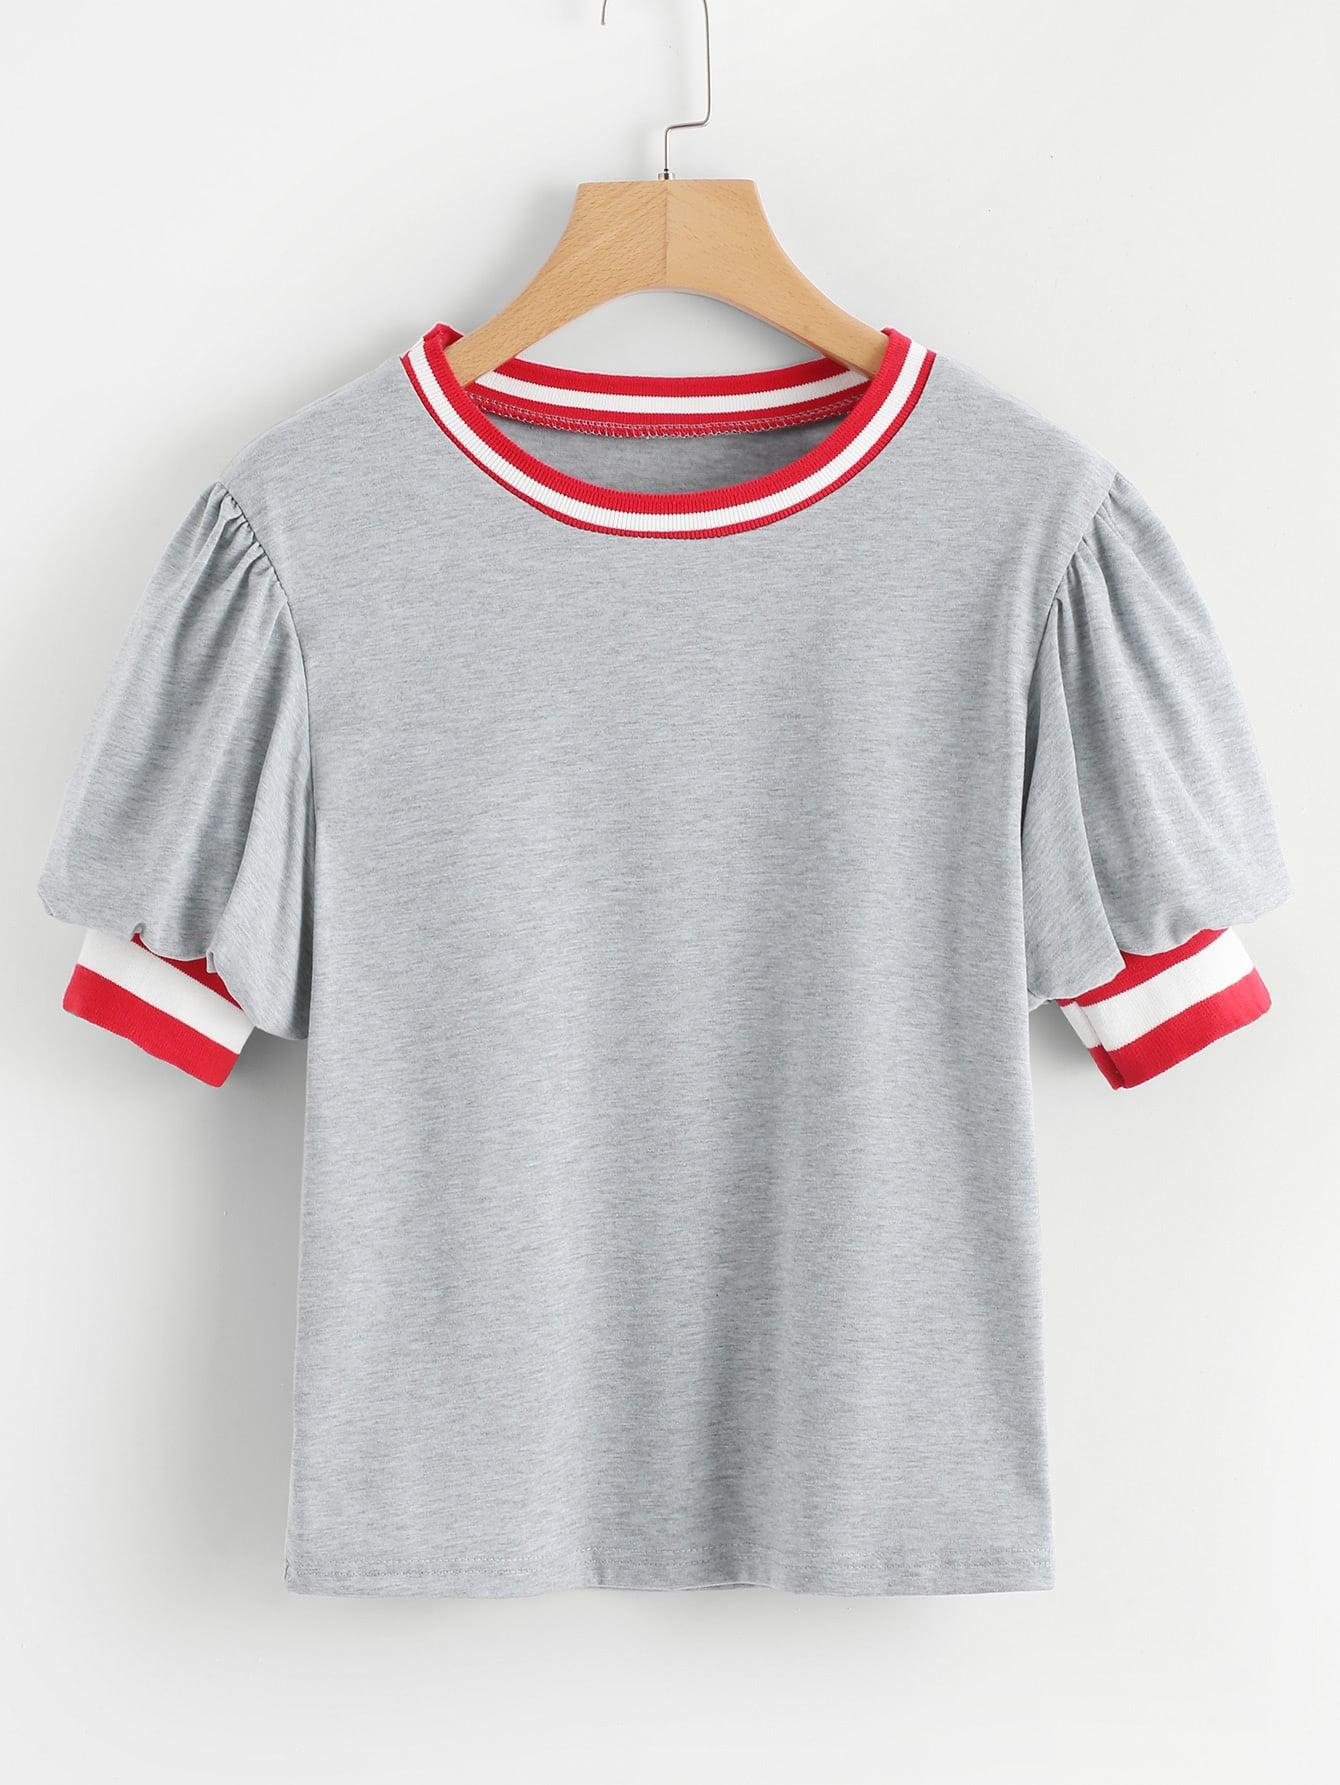 Фото Contrast Stripe Trim Lantern Sleeve Marled Tee men contrast stripe trim tee